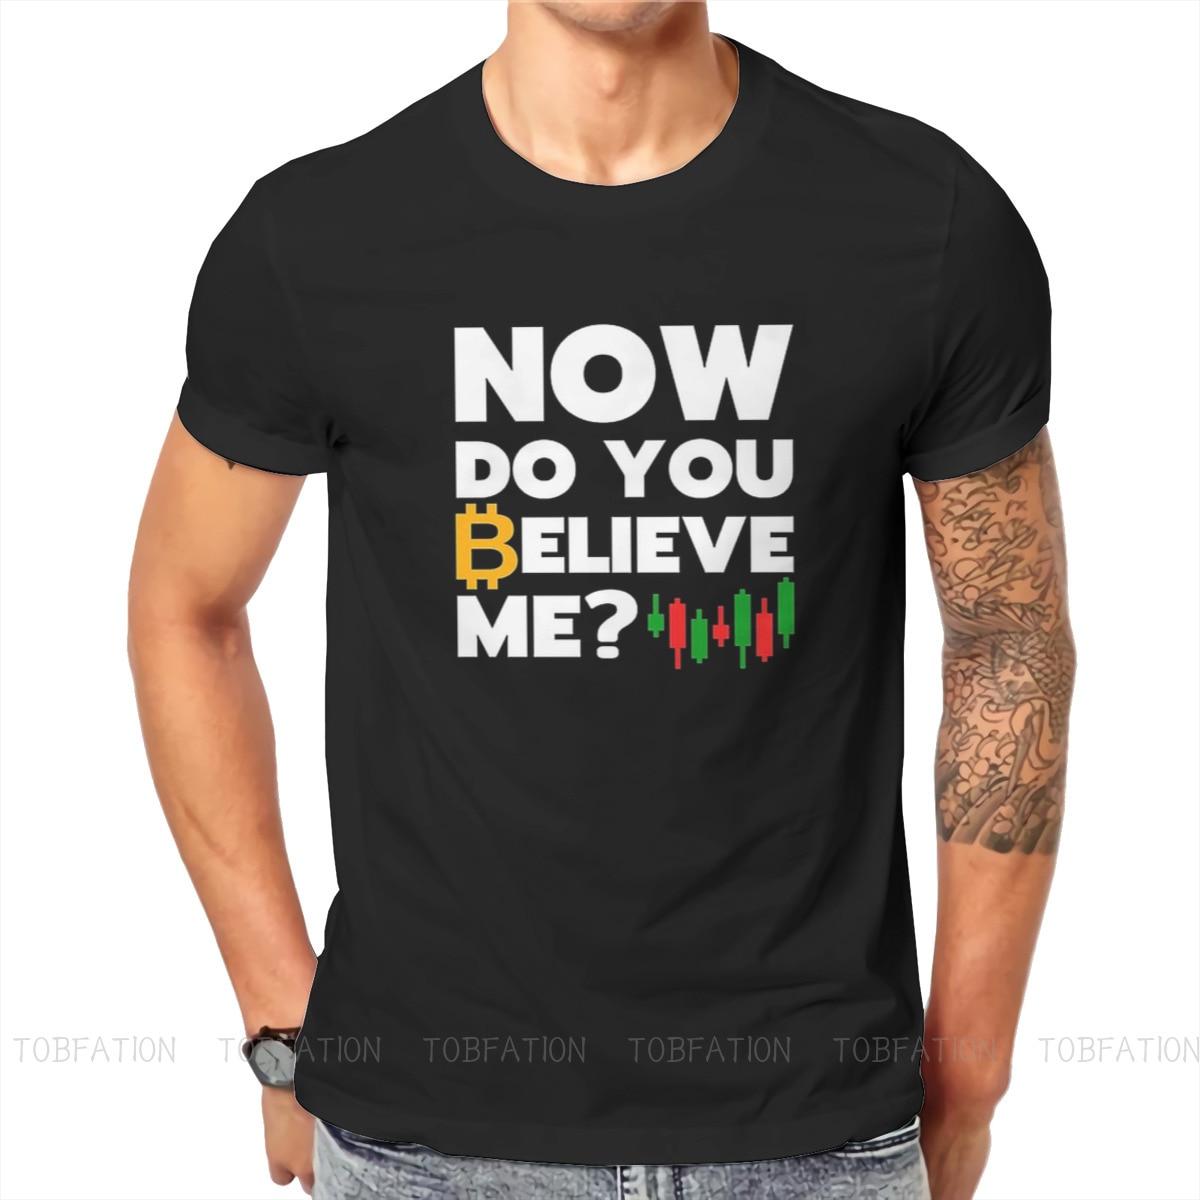 Believe Me Bitcoin Art Satoshi Nakamoto Tshirt Top Cotton Loose Ofertas Men's Clothes Casual Men T shirt